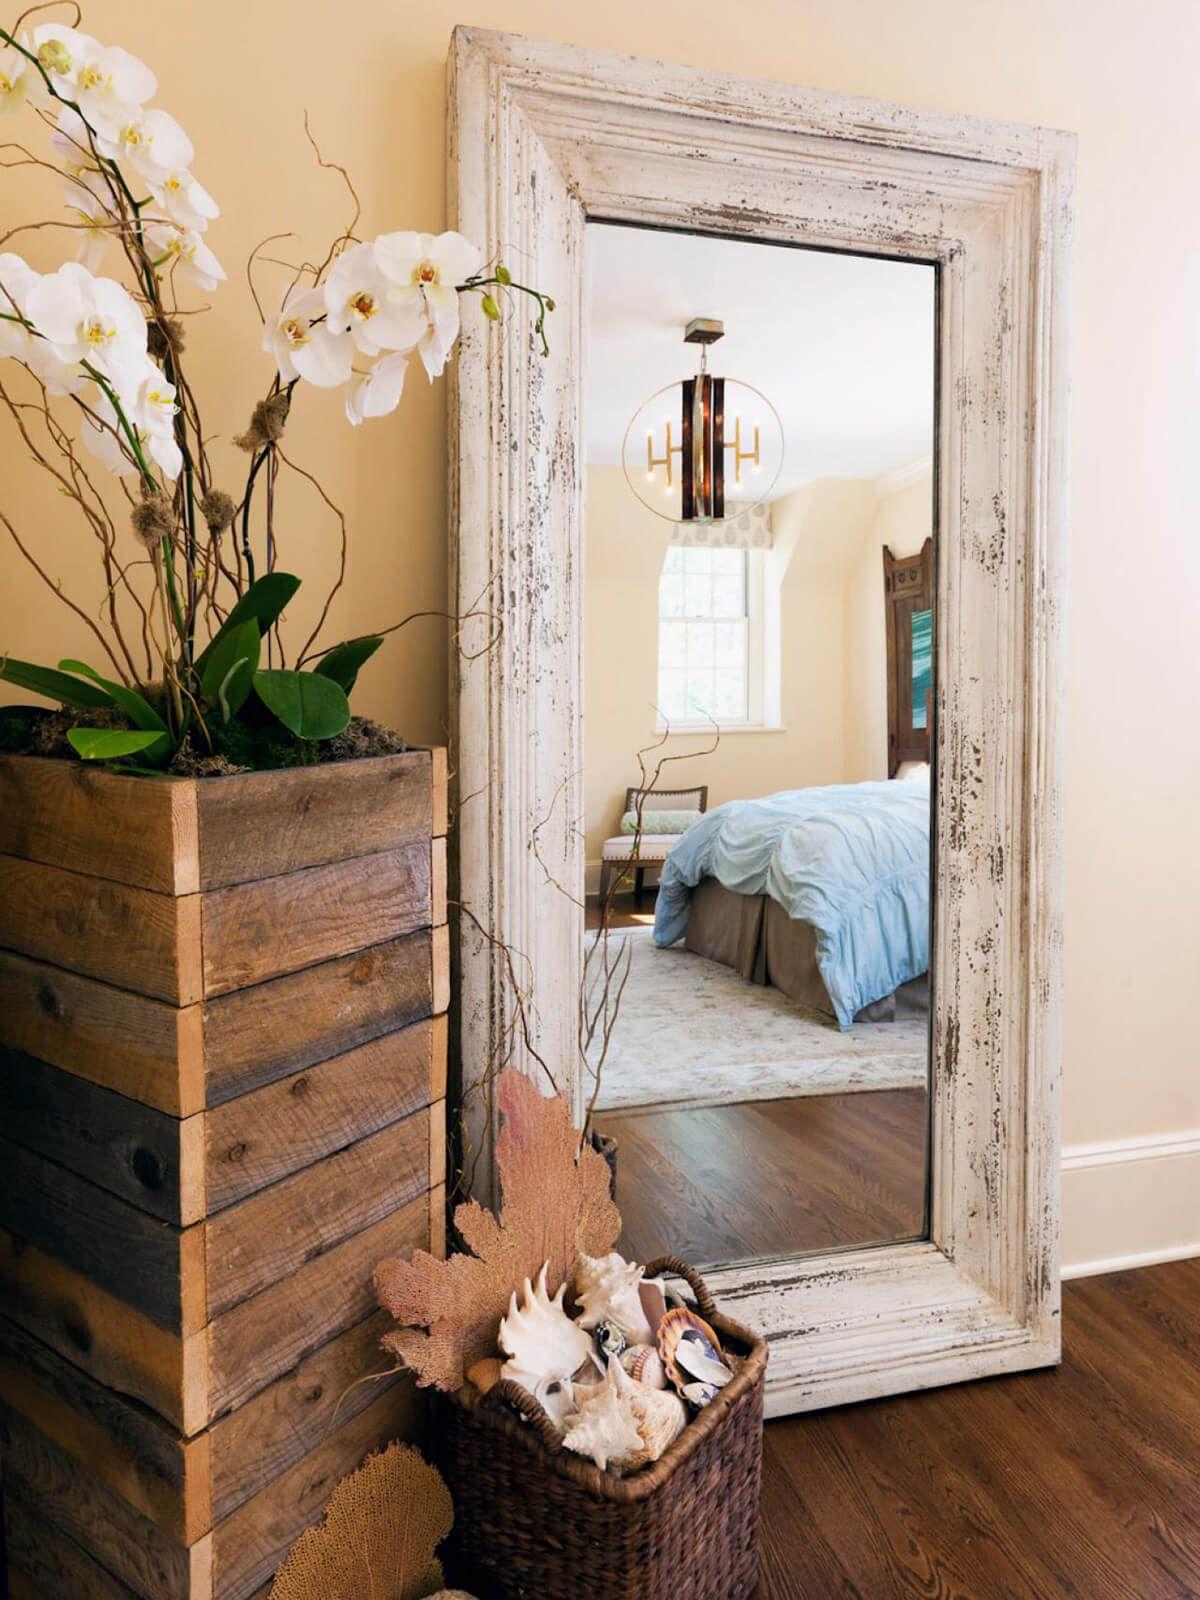 33 mirror decoration ideas to brighten your home